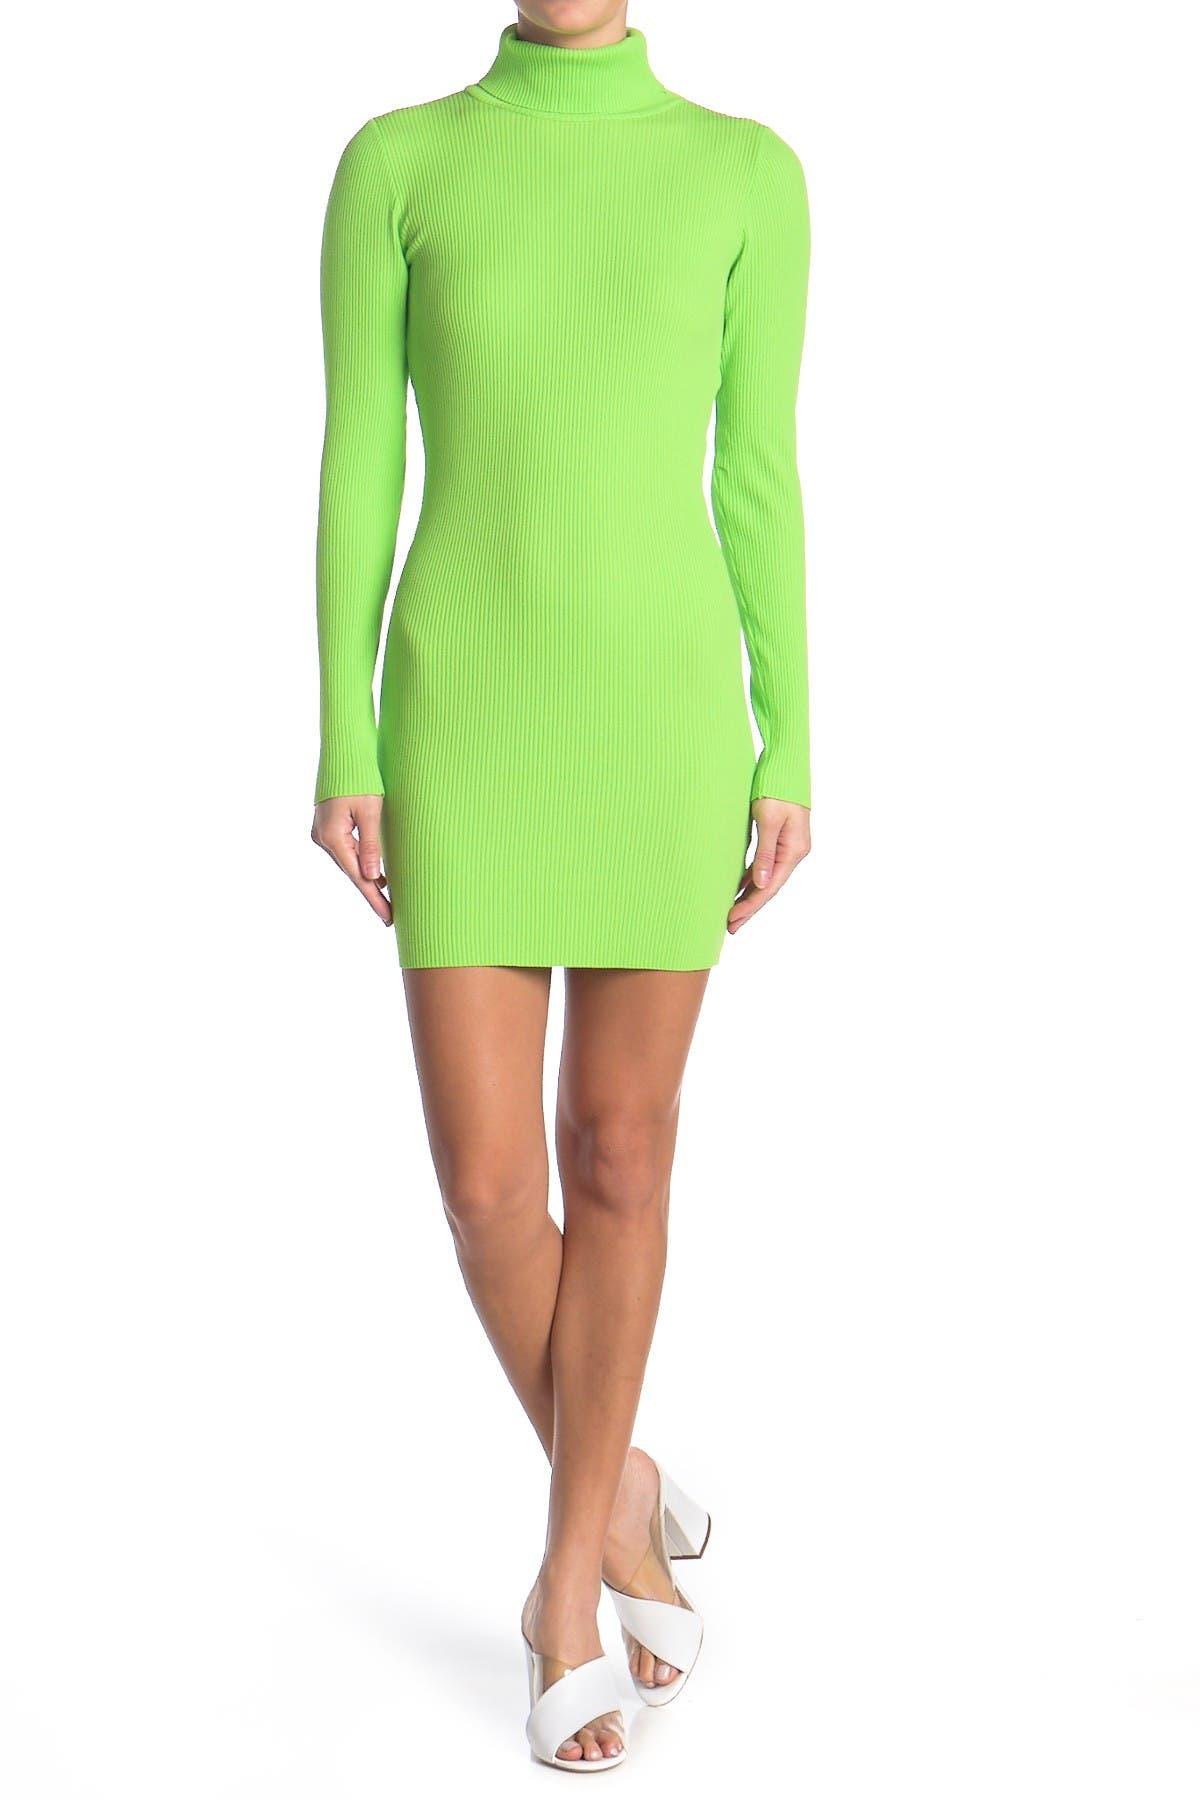 Image of re:named apparel Mona Turtleneck Sweater Dress